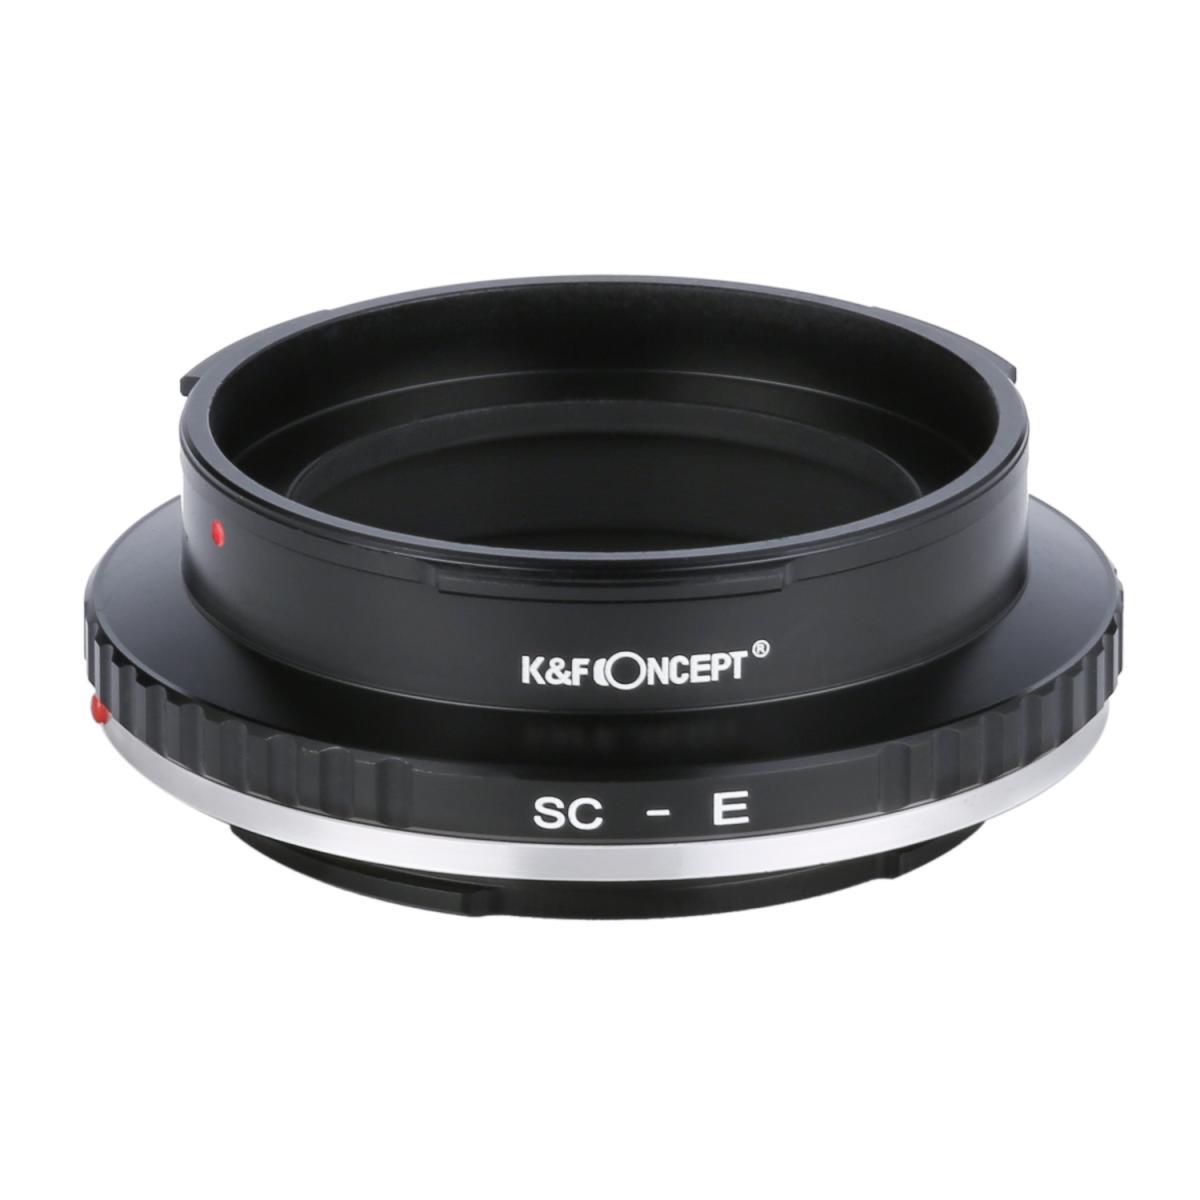 K&F M48101 Contax RF / Nikon S Lenses to Sony E Lens Mount Adapter